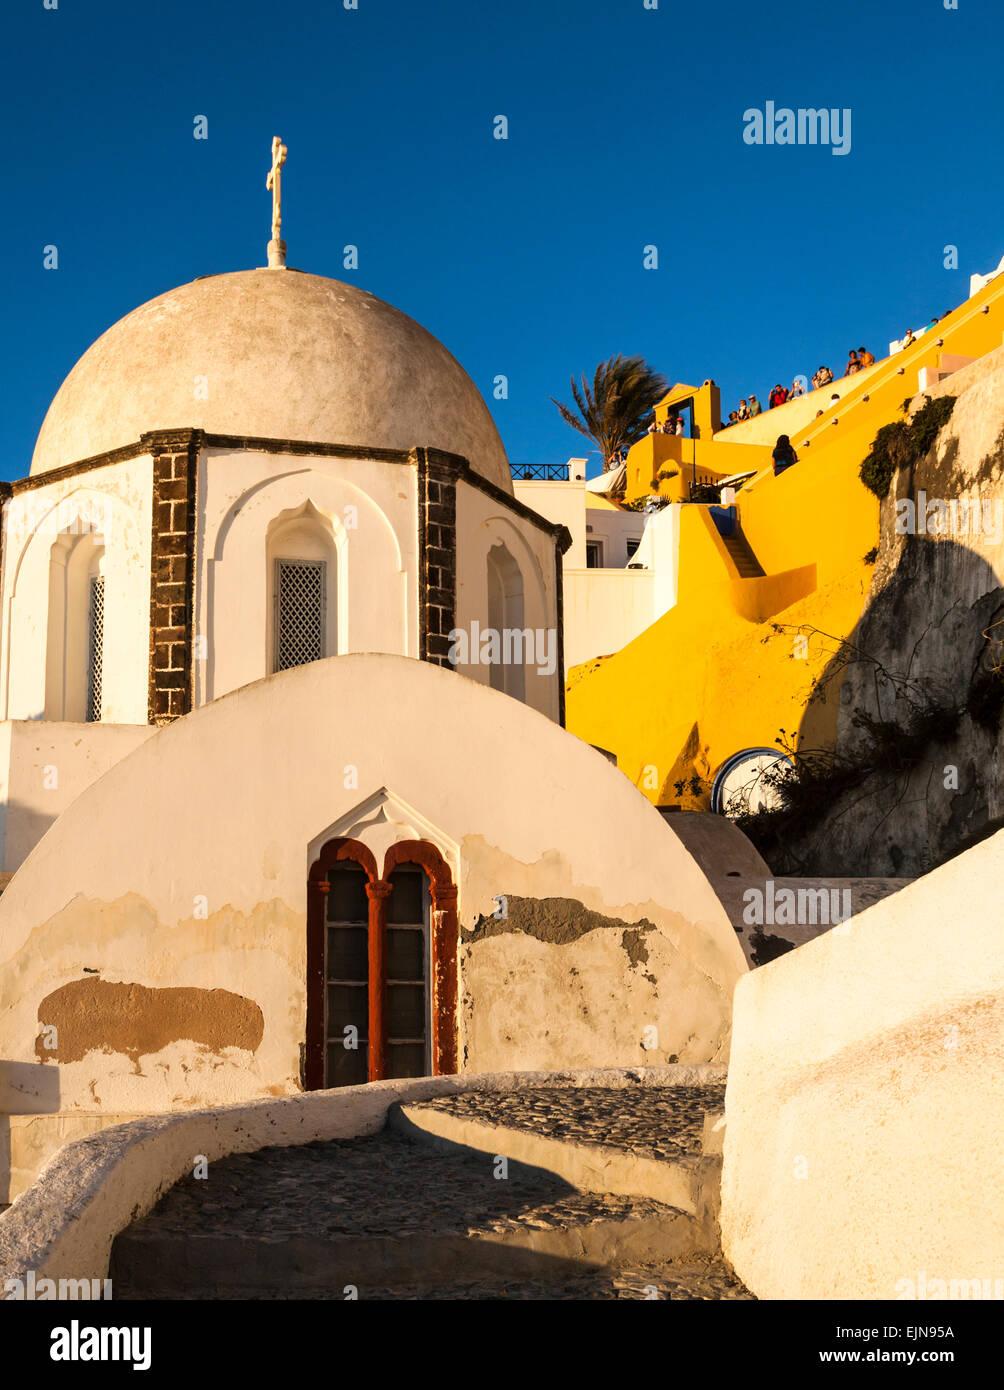 An old neglected empty church, Fira, Santorini (Thera), Greece. - Stock Image